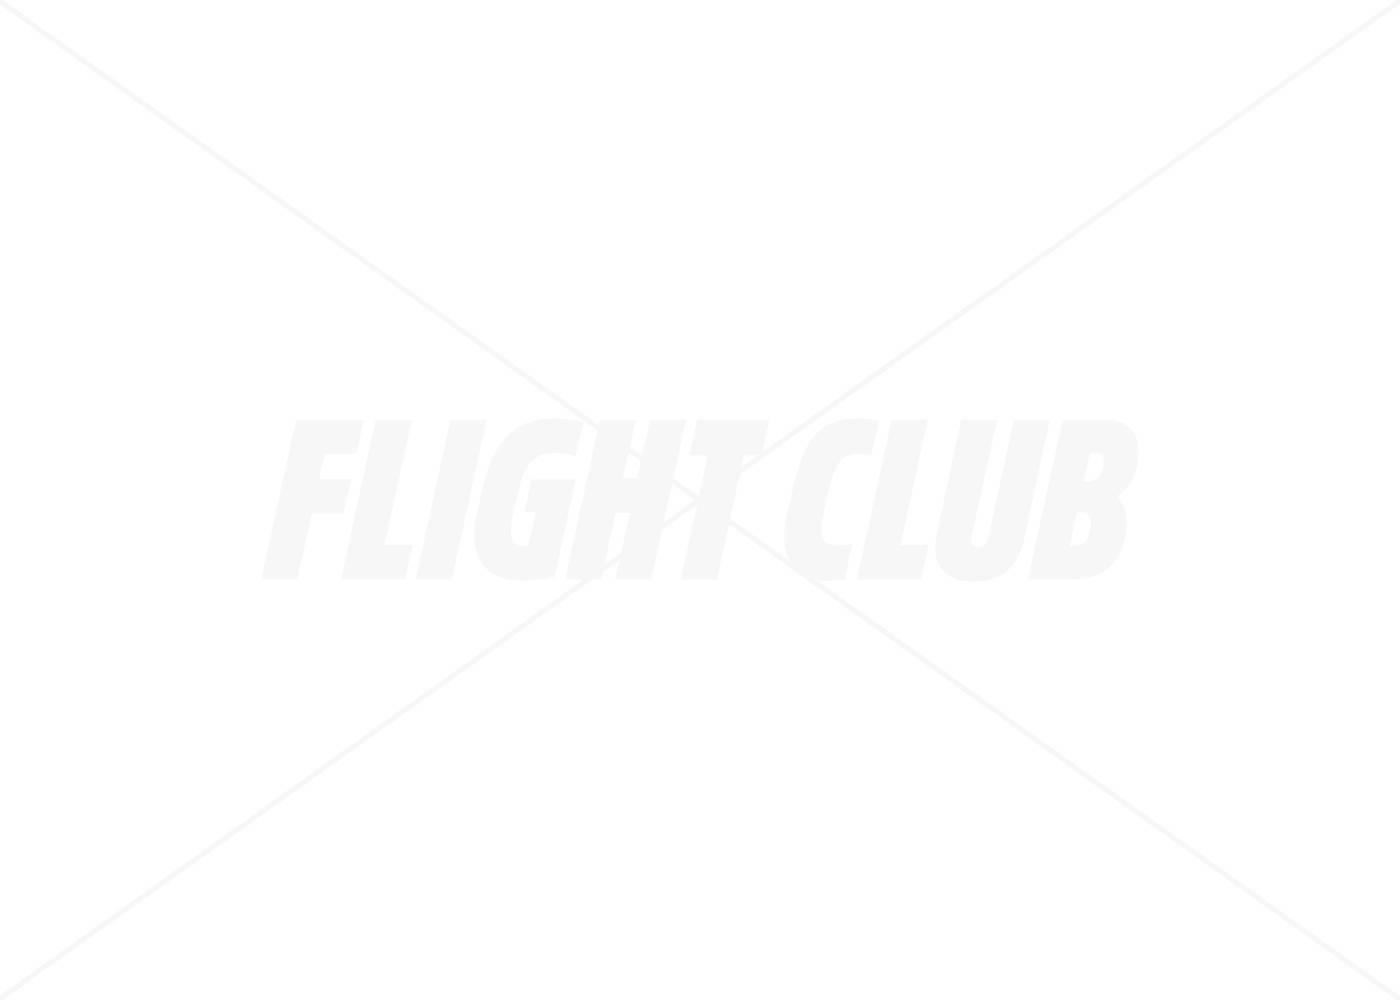 b705110fa5 Sneakers. Here. | Flight Club